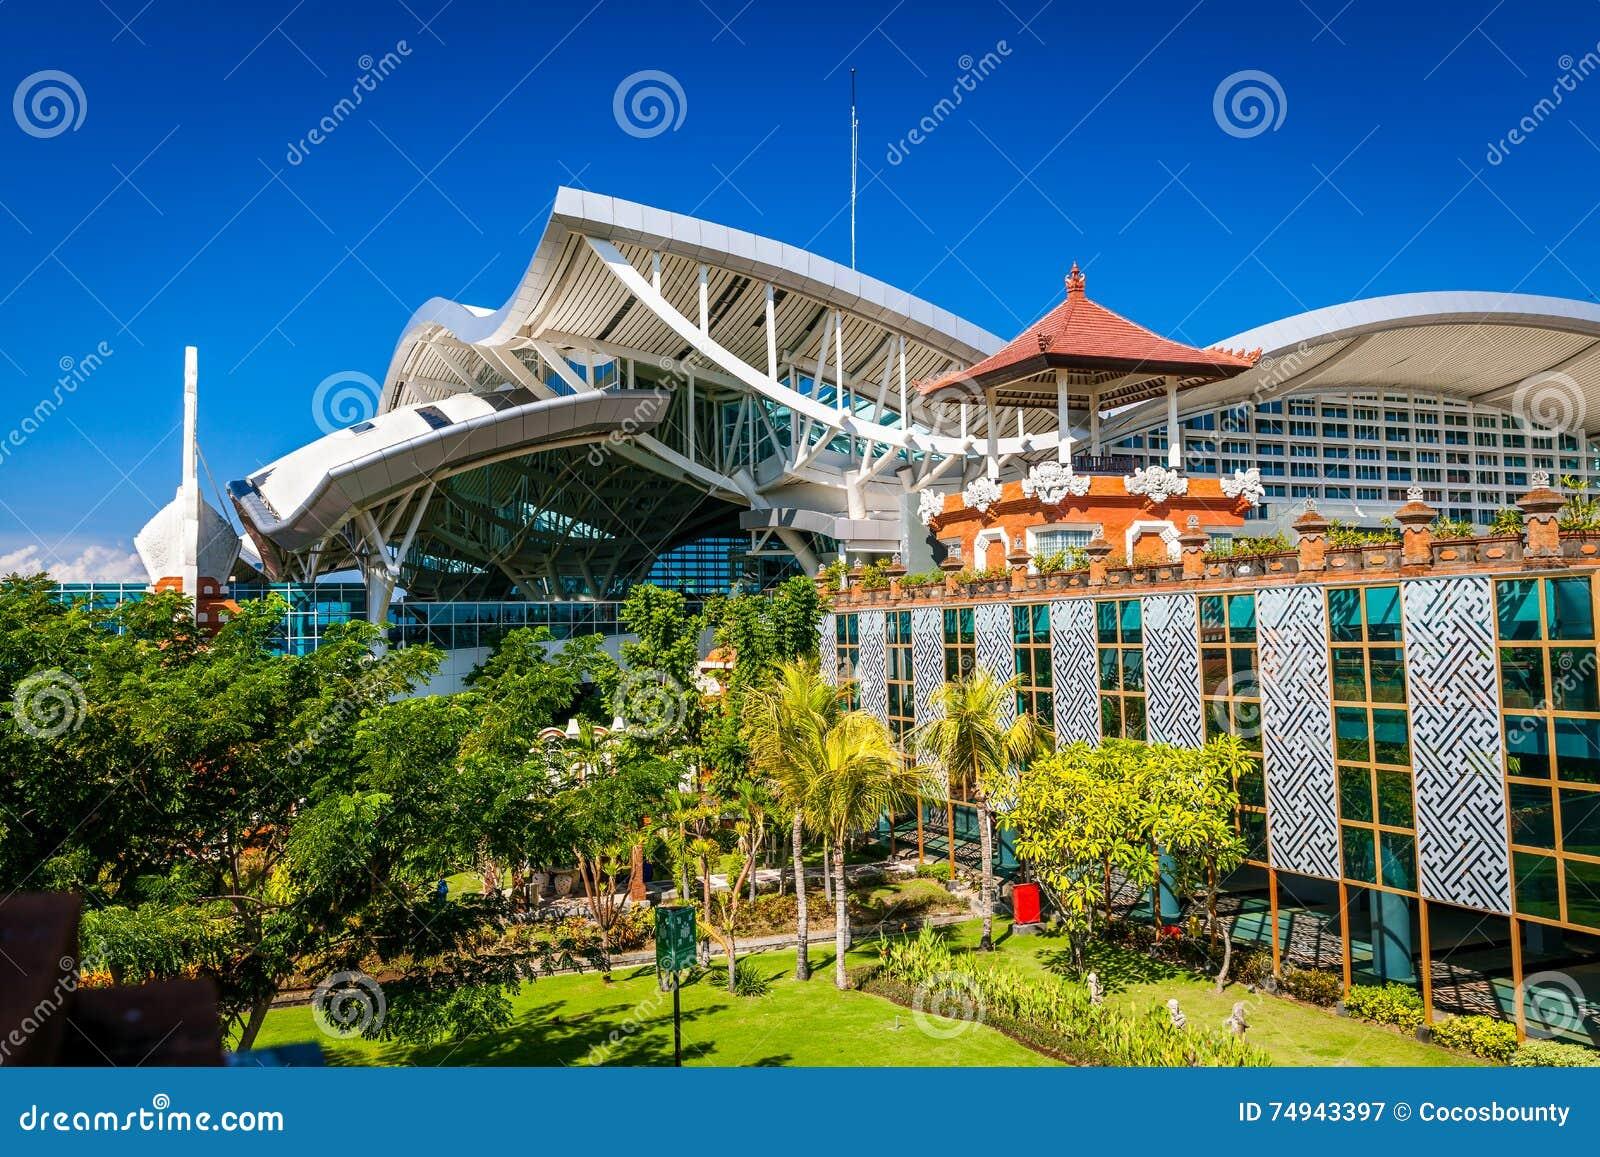 Aeroporto Bali : Aeroporto internacional de bali denpasar na ilha tropical bali